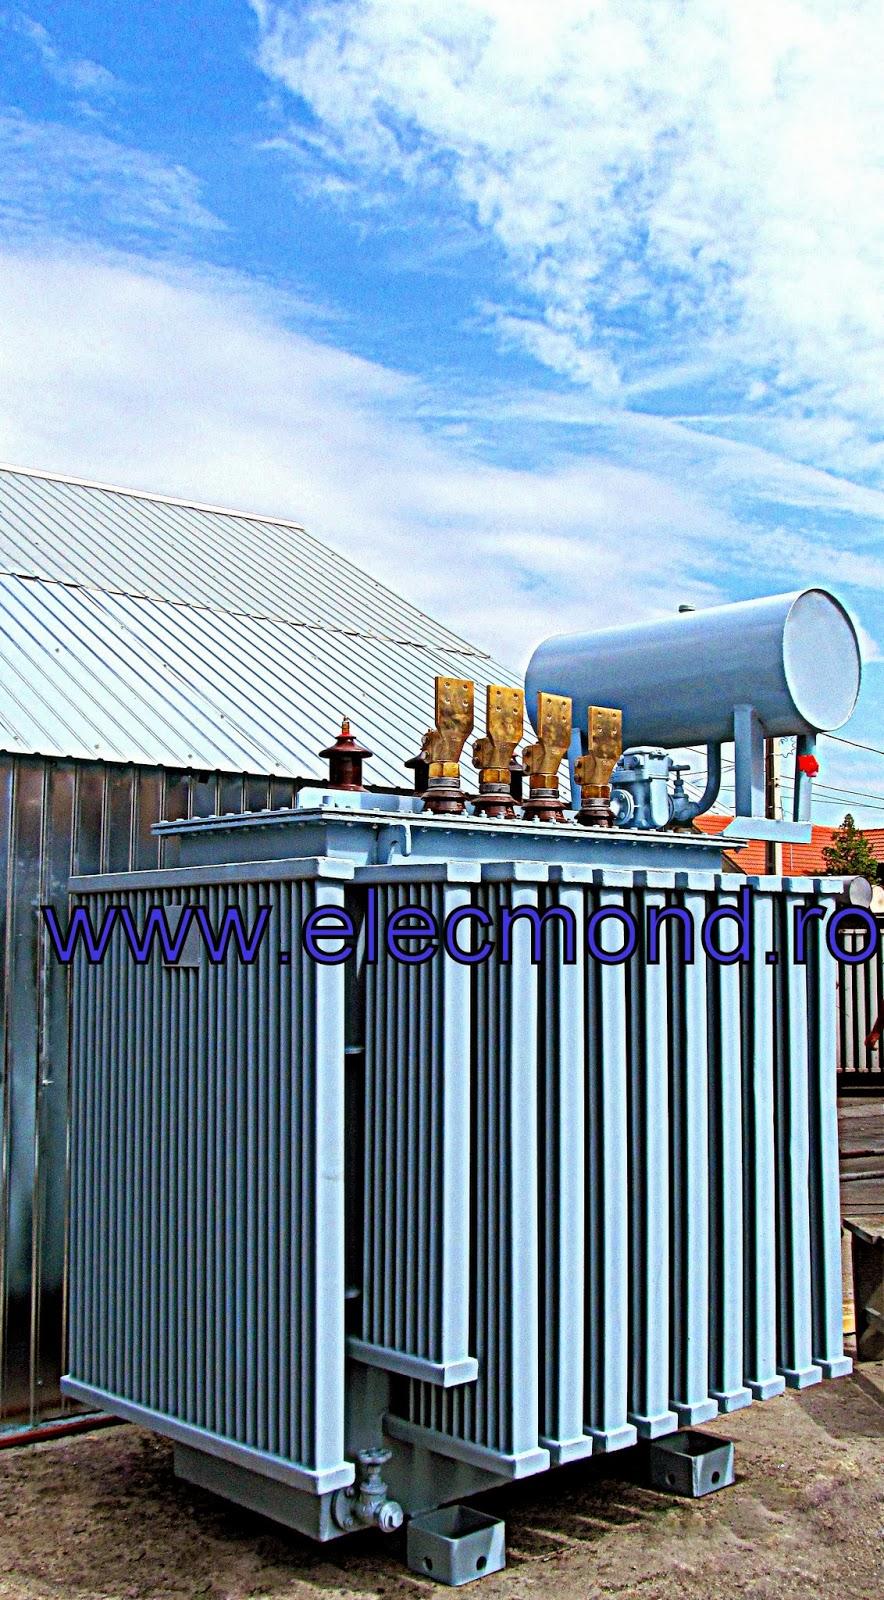 TRANSFORMATOR 1600 kVA , transformatoare 1600 kVA , trafo 1600 , transformatoare , transformator , pret transformator , transformatoare de putere , elecmond  ,